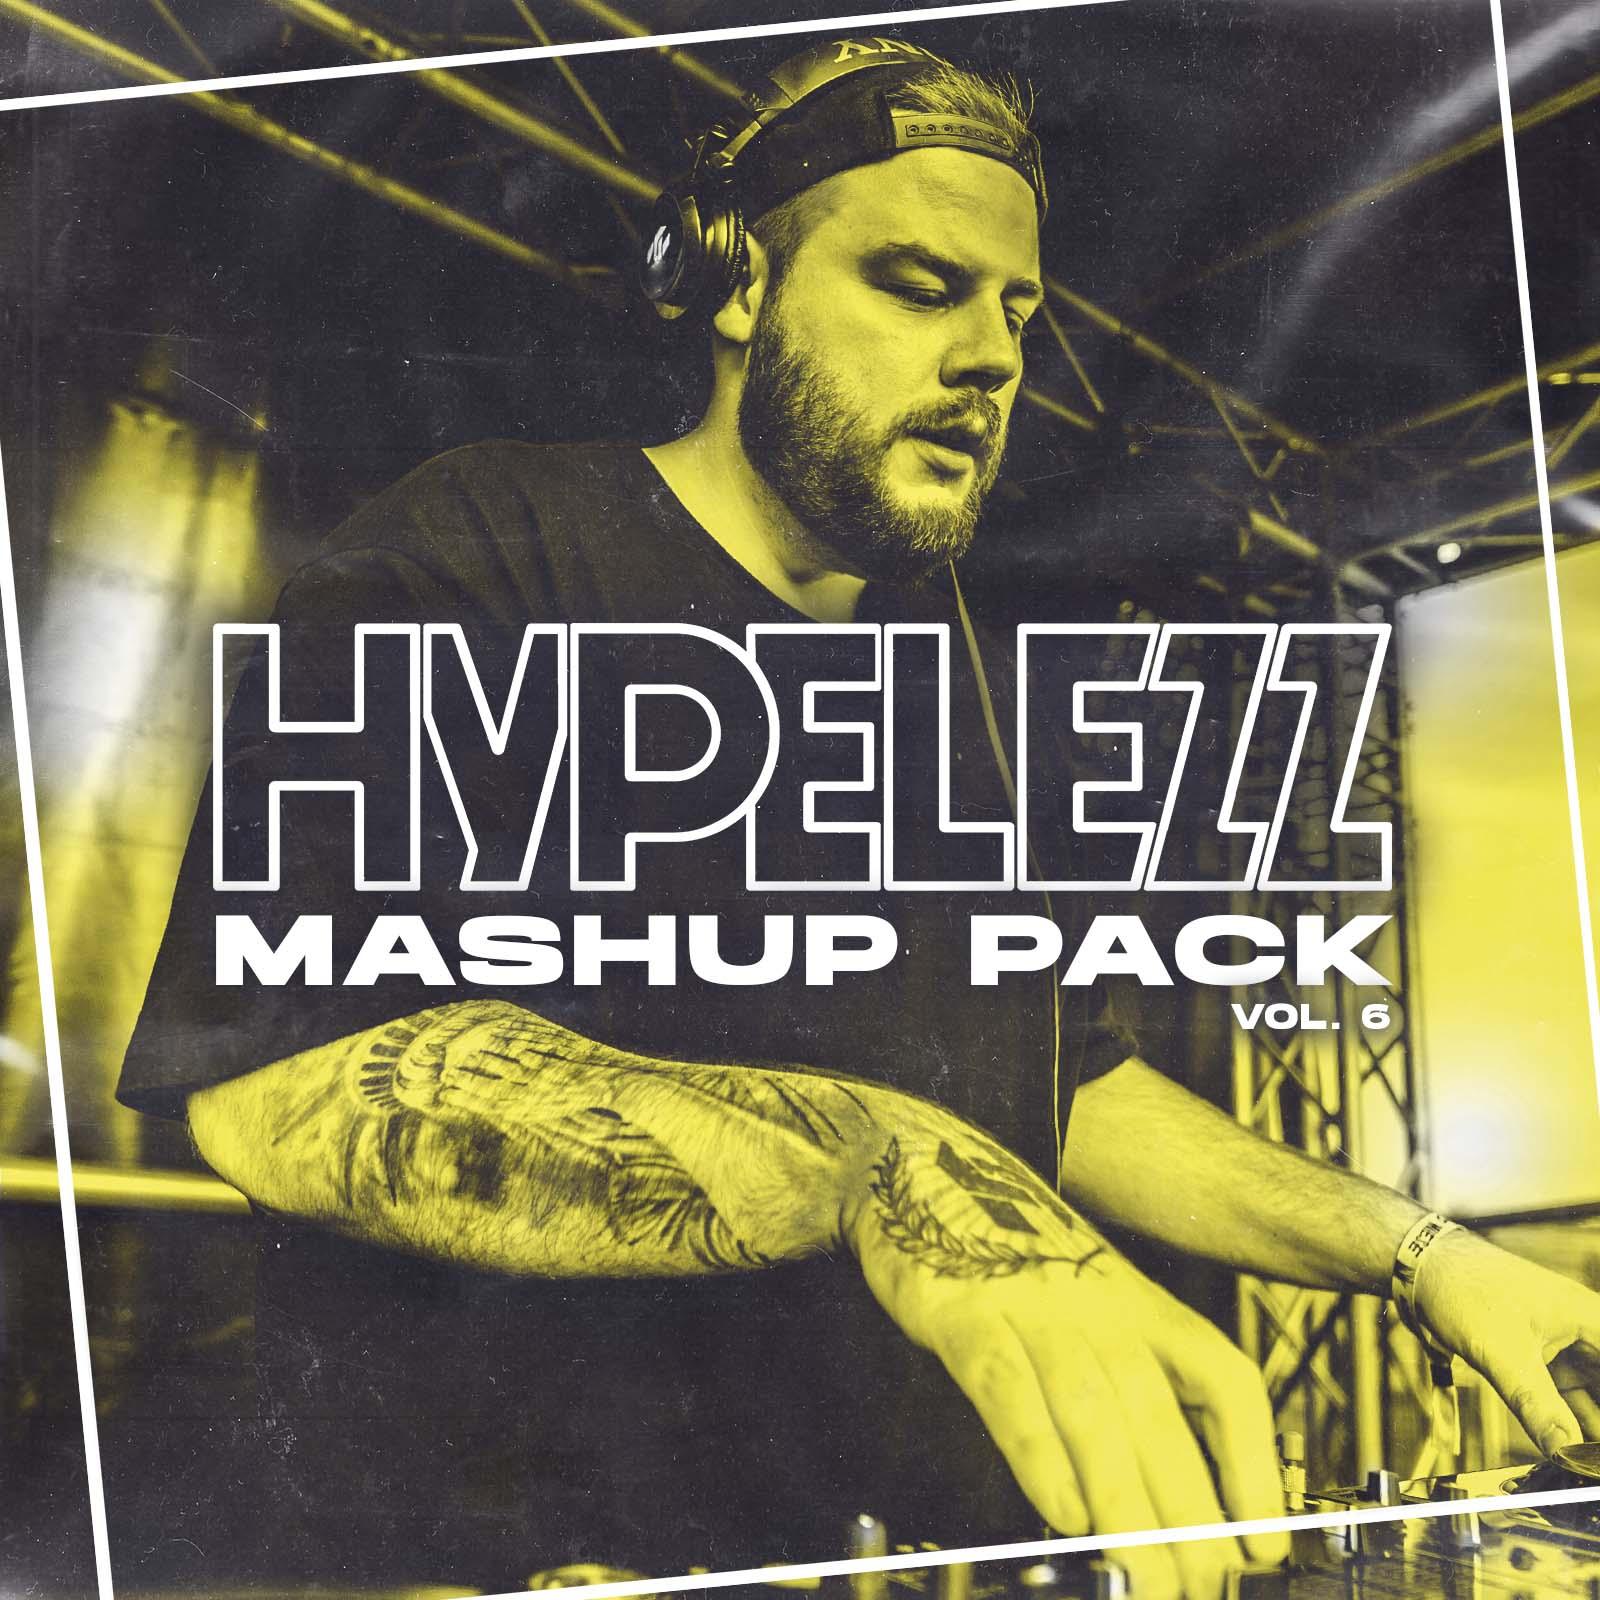 Hypelezz Mashup Pack Vol. 6